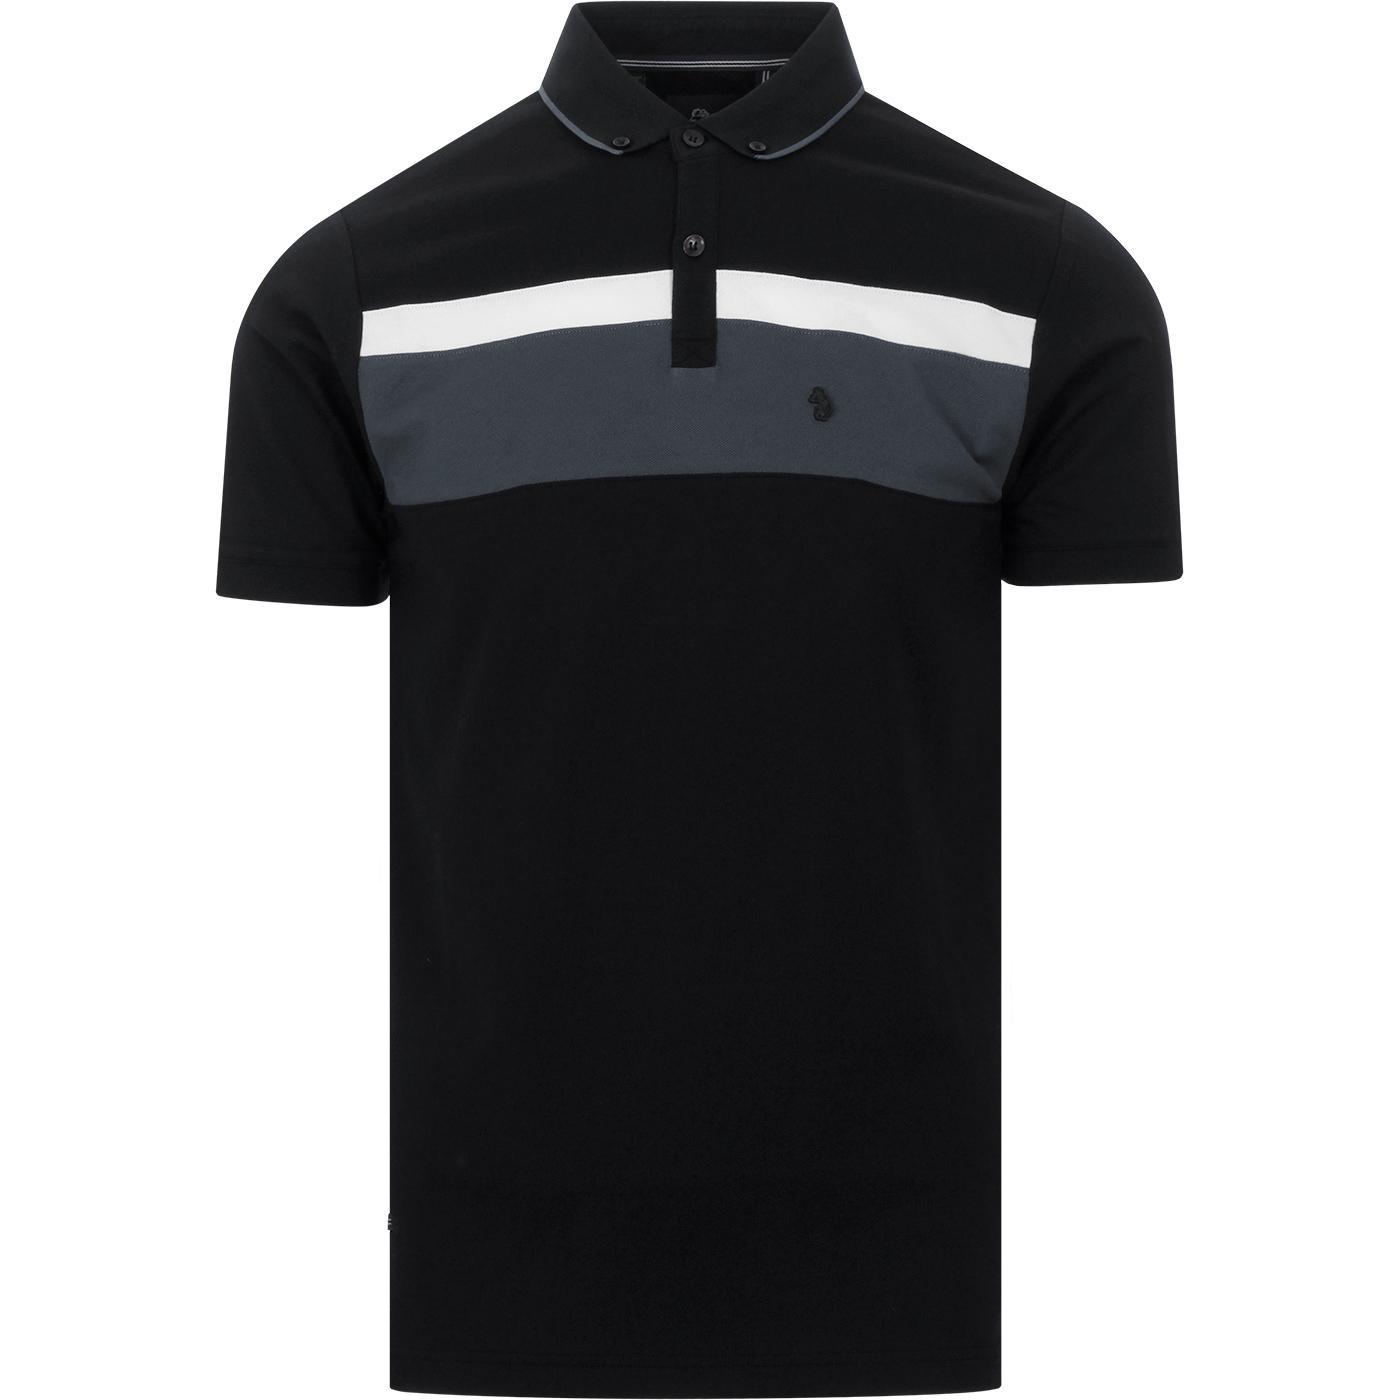 Outdy Nial LUKE Retro Mod Chest Stripe Polo BLACK